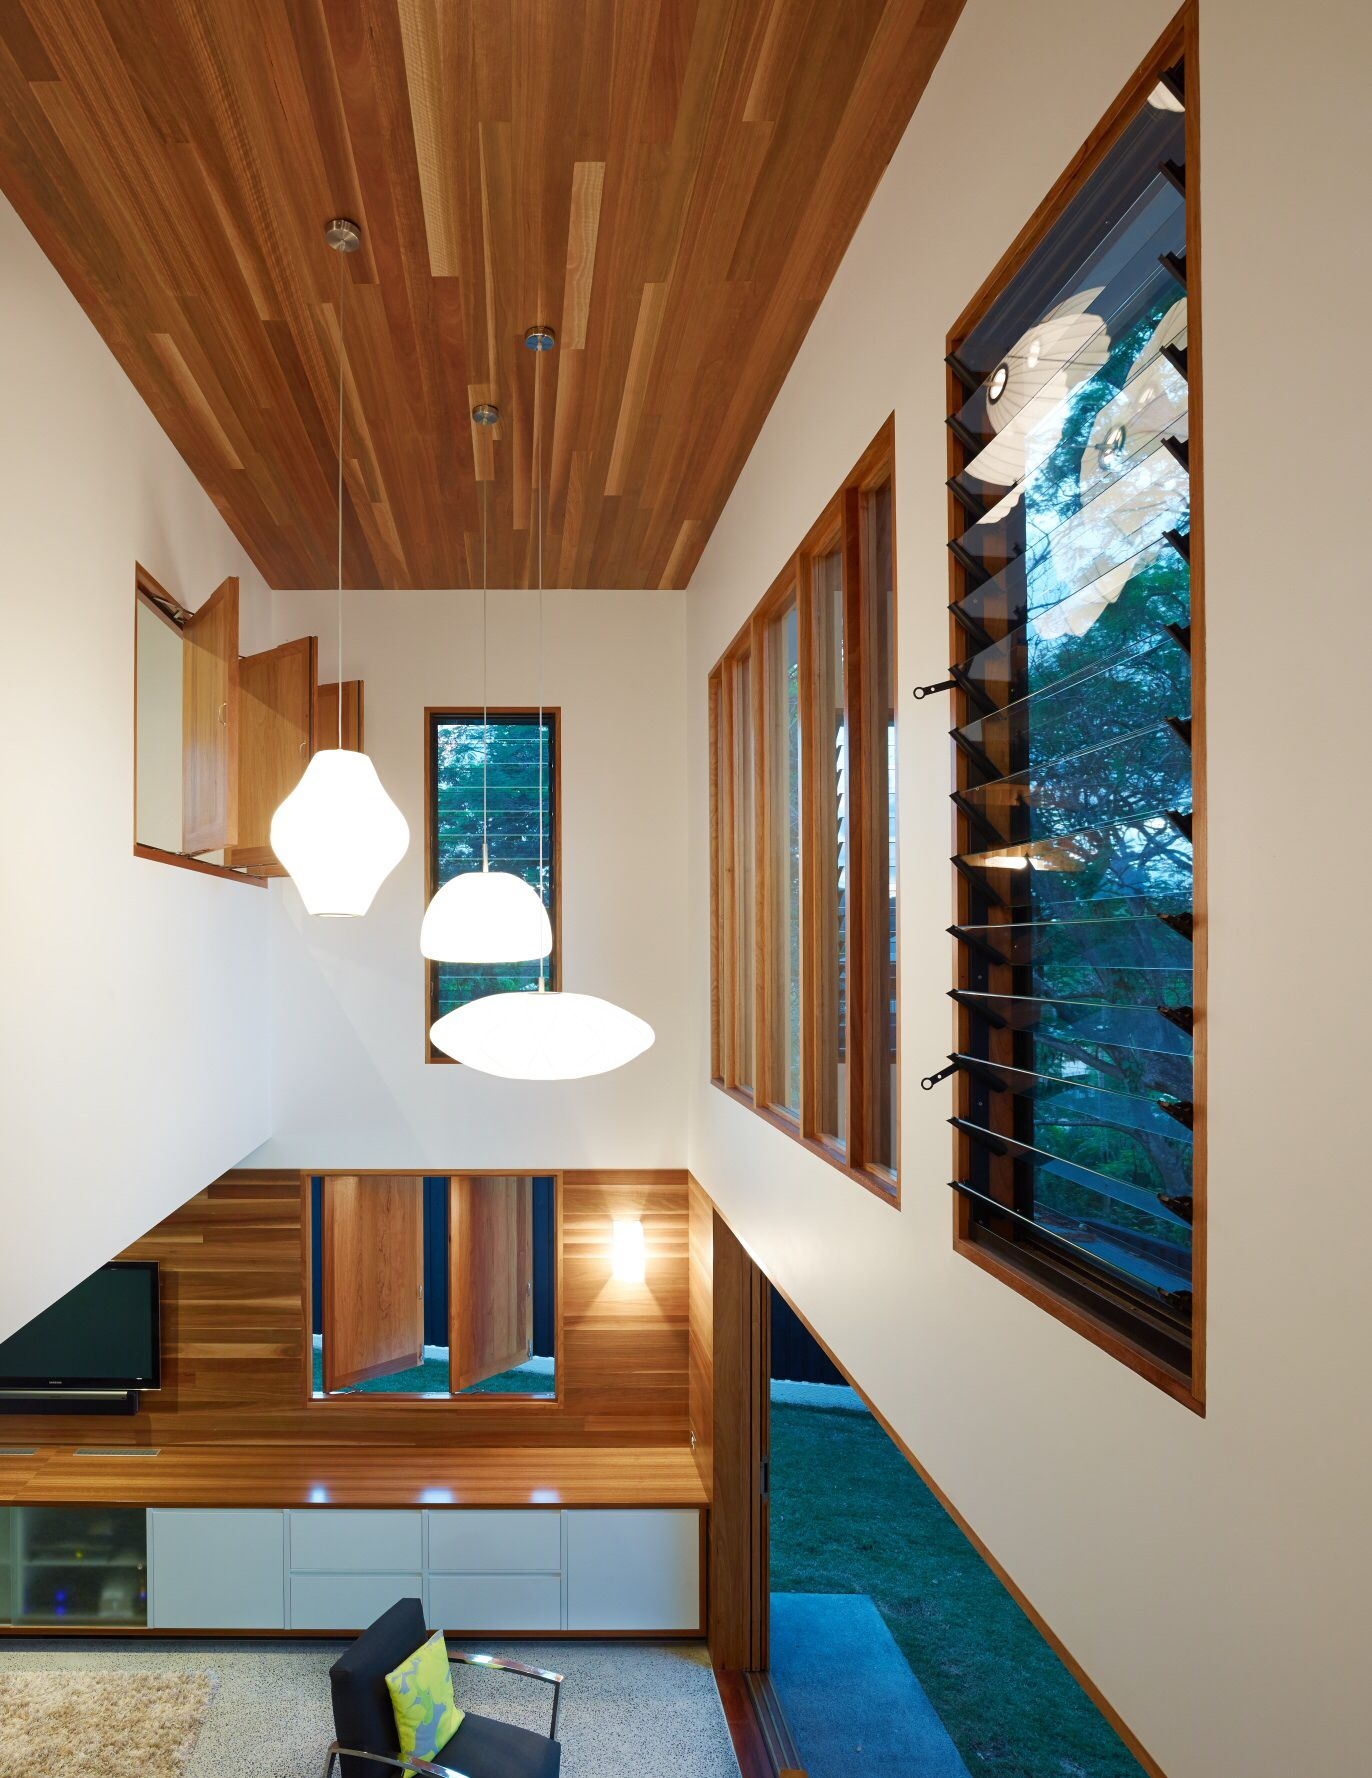 Post PostWar House by Shaun Lockyer Architects Brisbane Australia